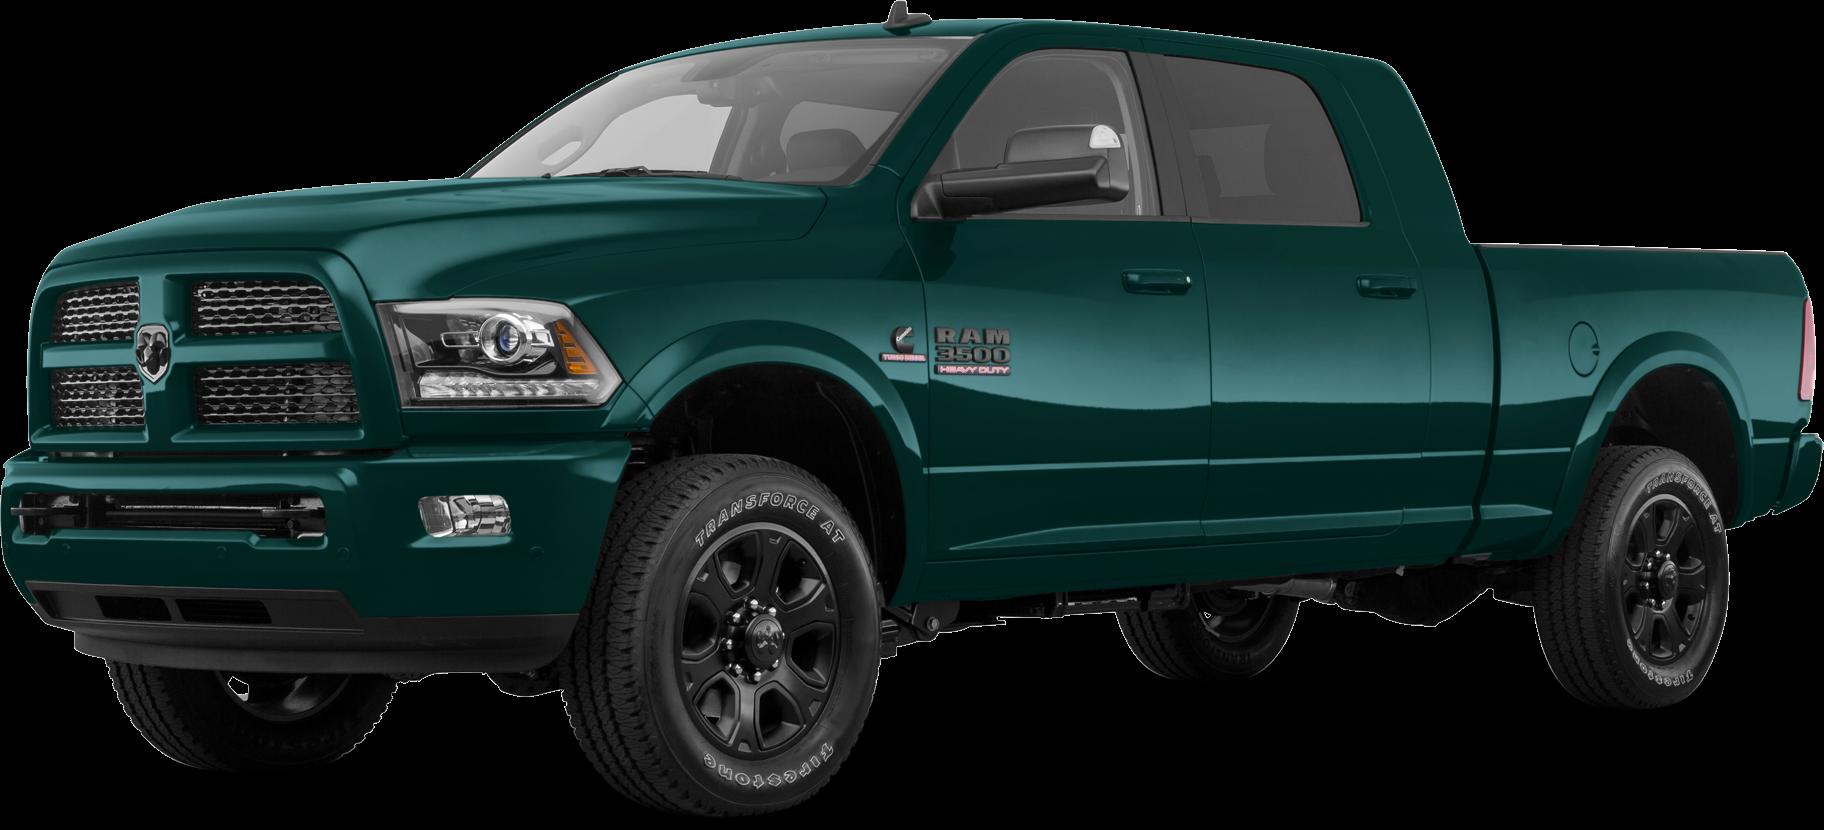 2016 GMC Sierra 3500 HD Crew Cab | Pricing, Ratings, Expert